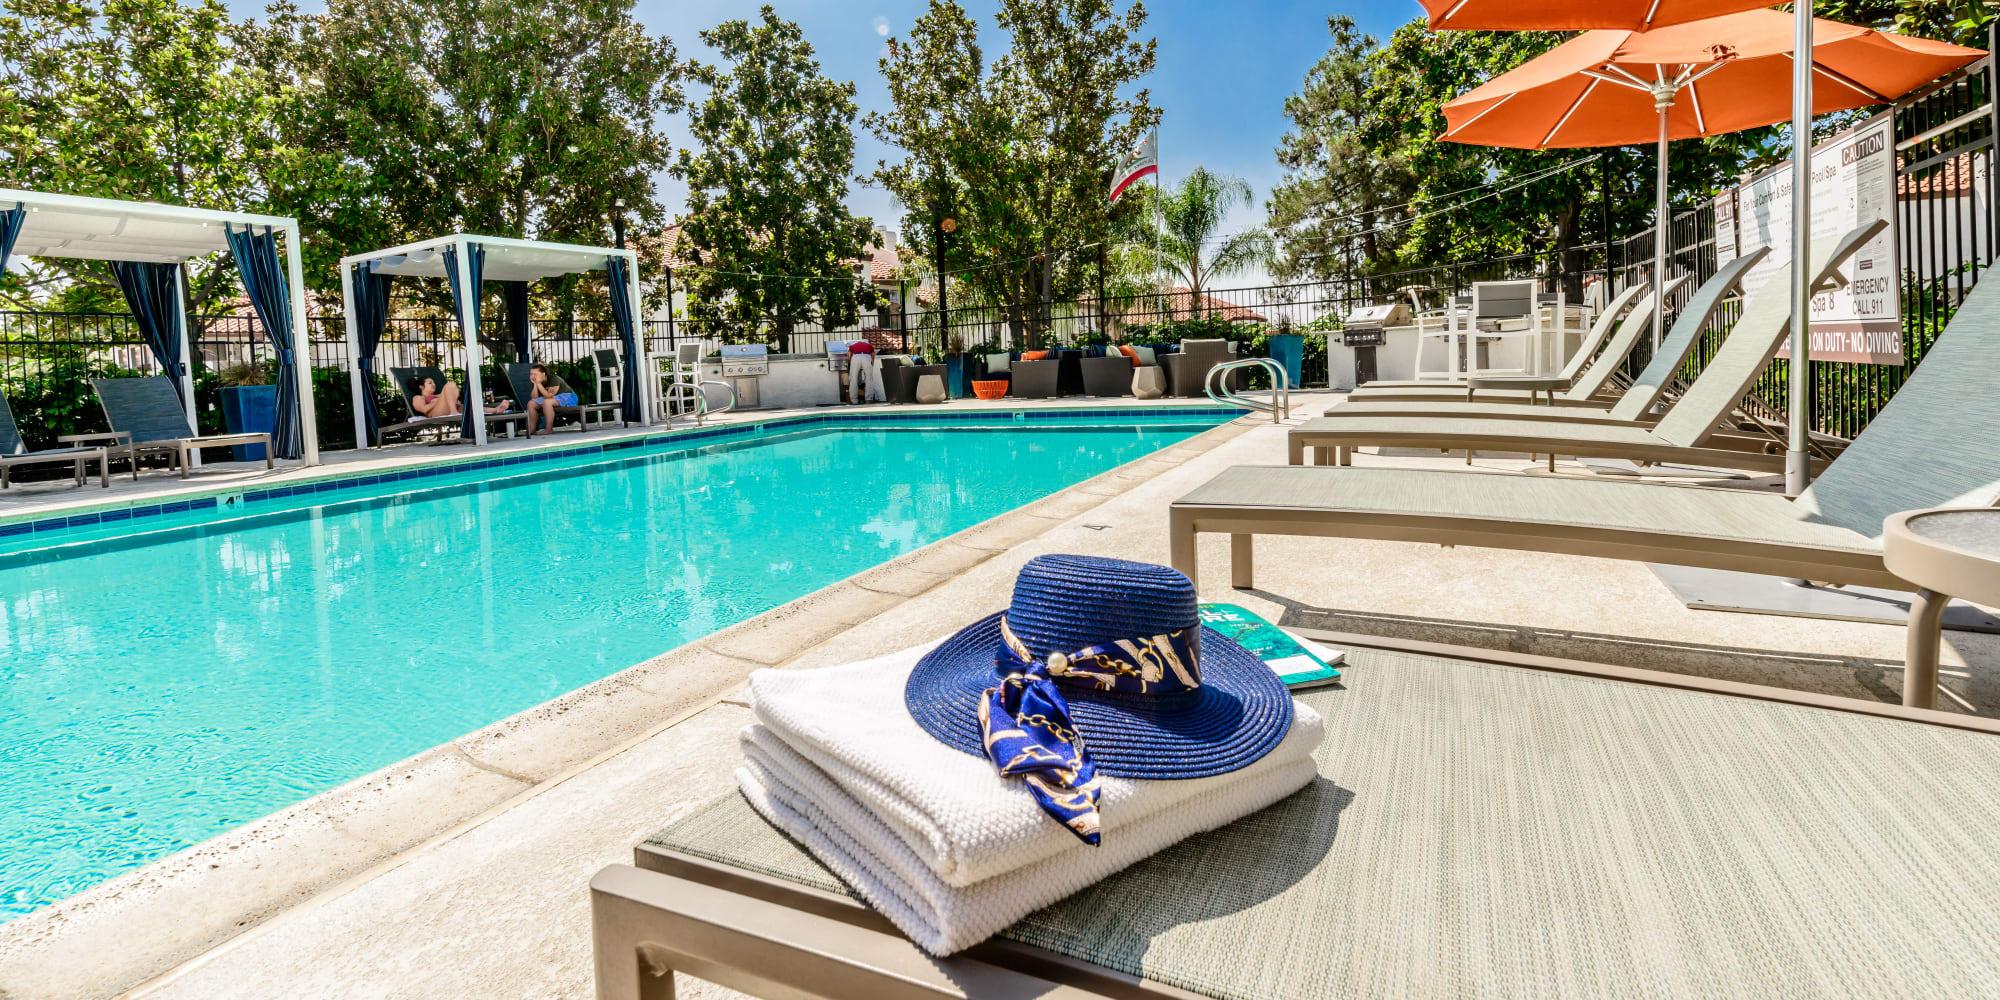 Apartments at Sonora at Alta Loma in Alta Loma, California